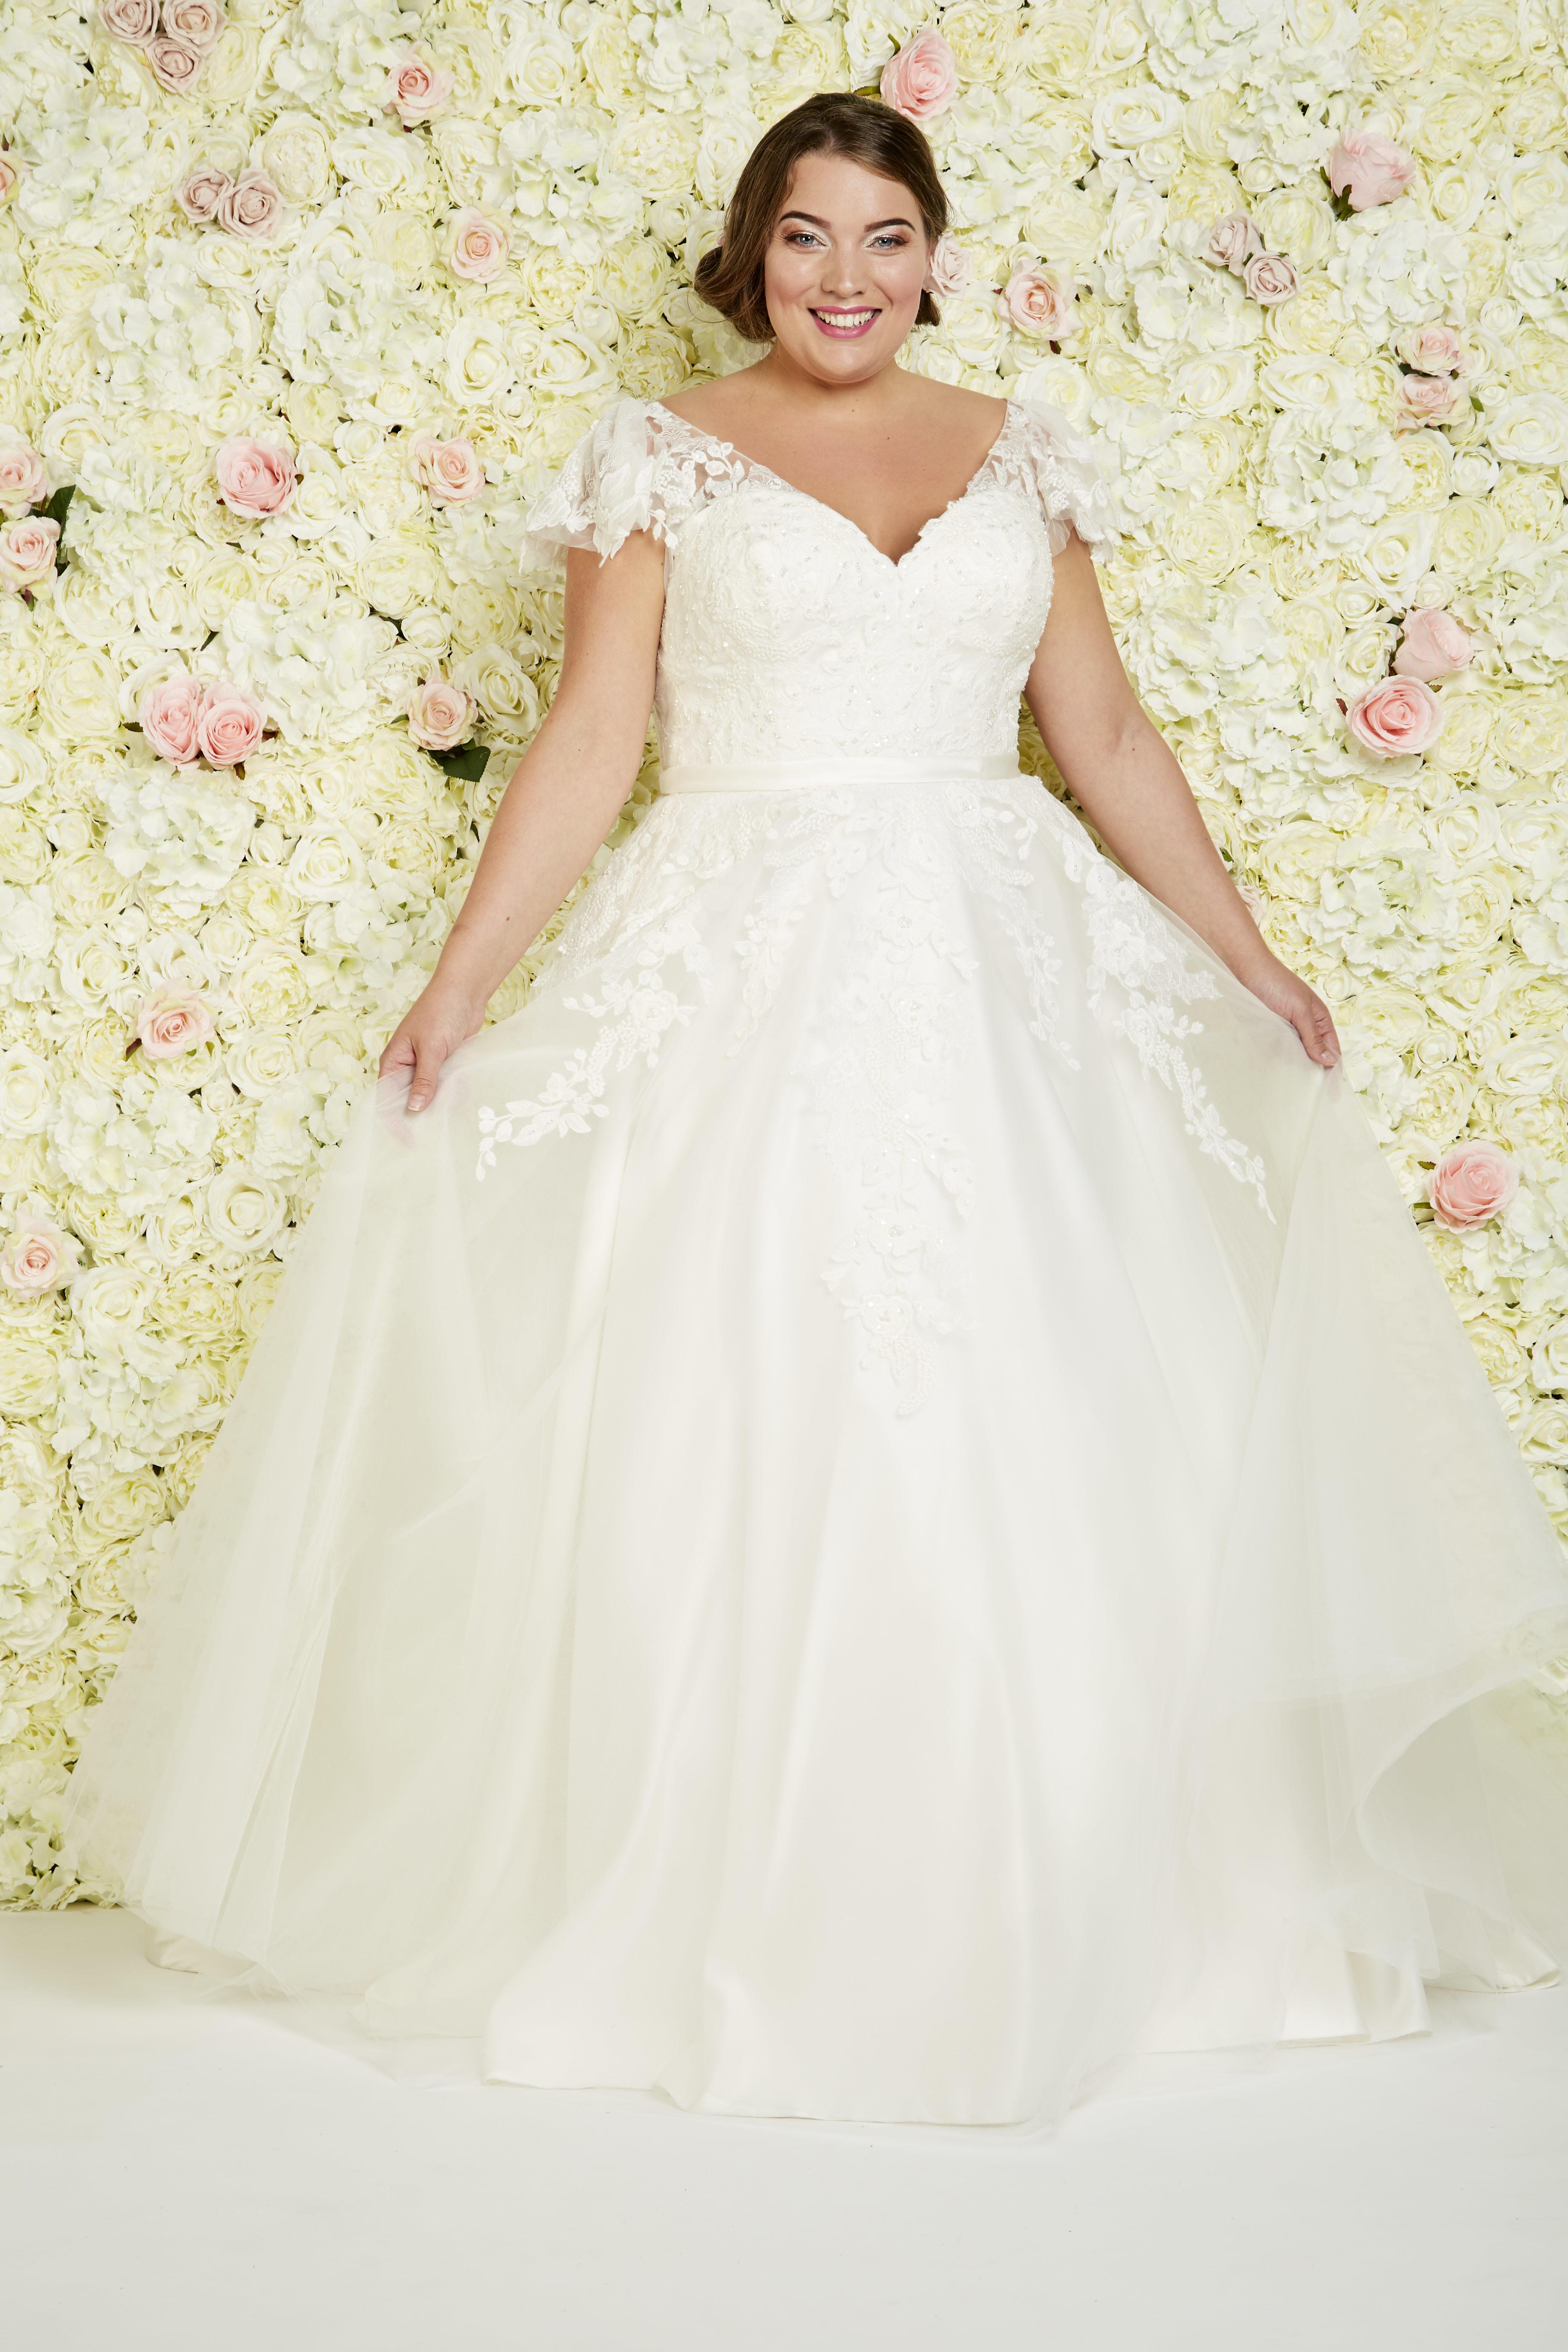 Hampshires Stockist of Callista Bridal Wear